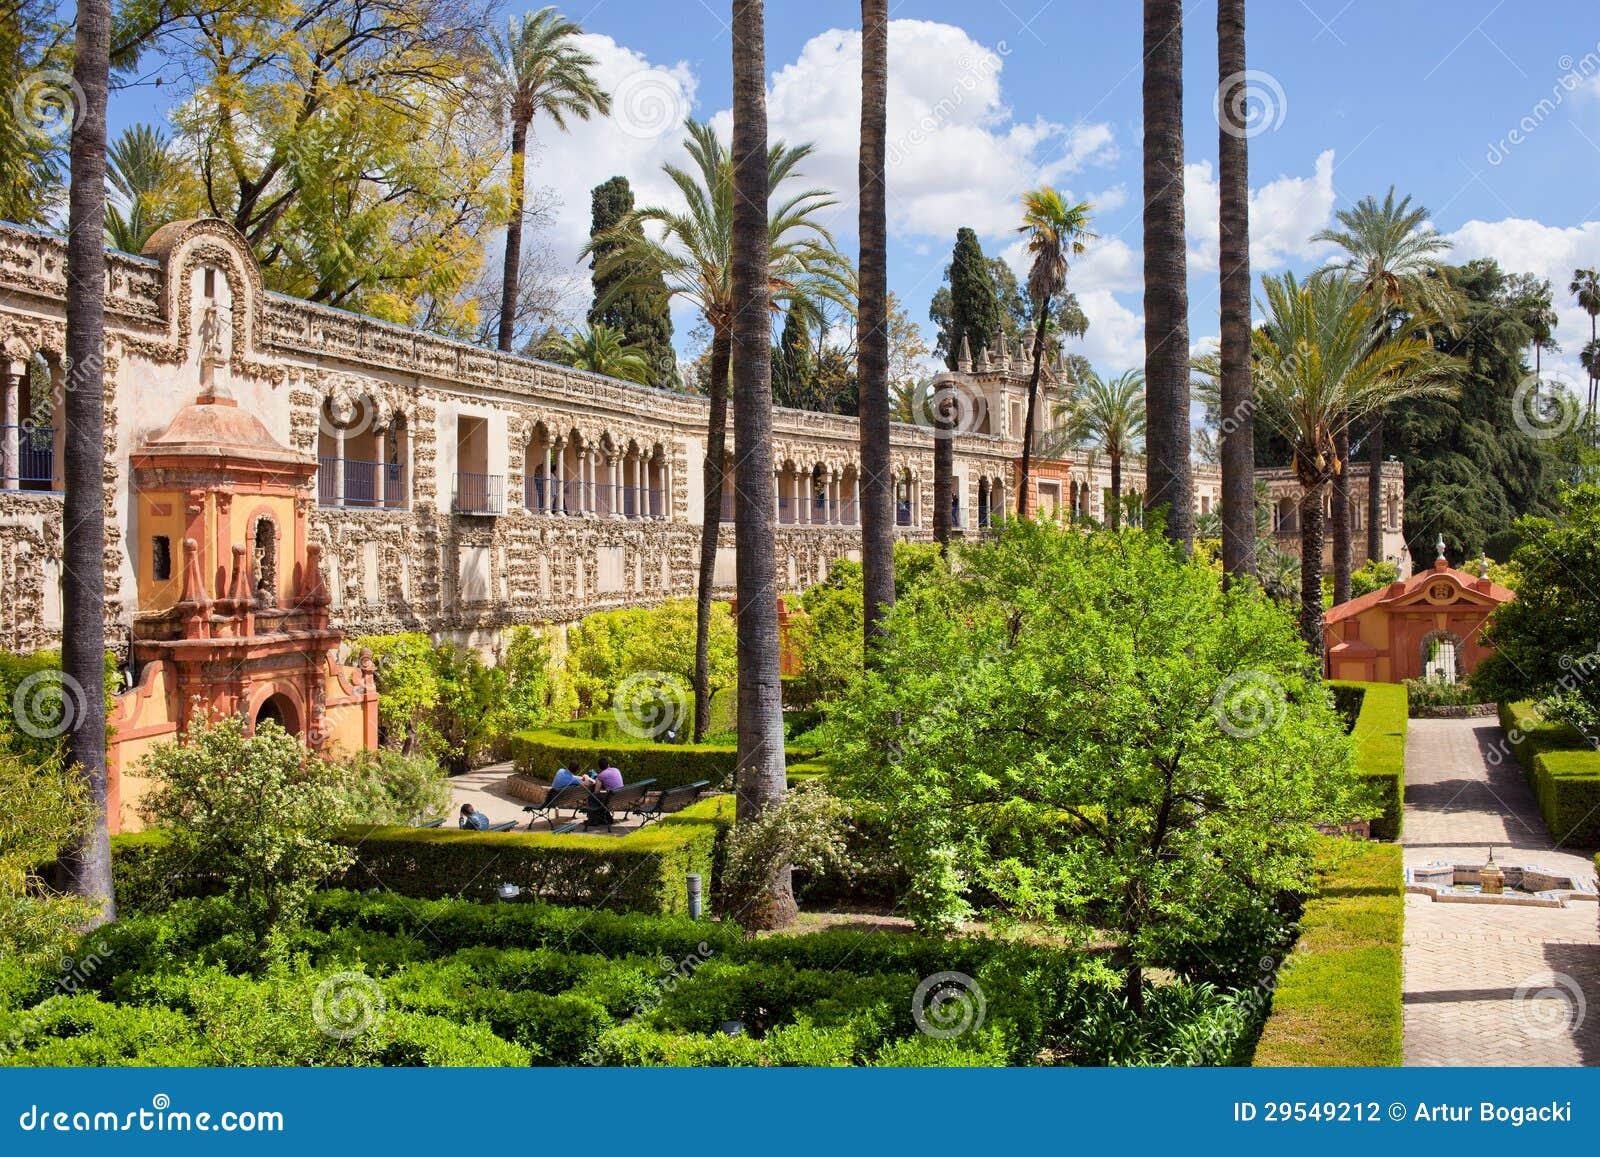 Garden Of The Pond In Real Alcazar Of Seville Stock